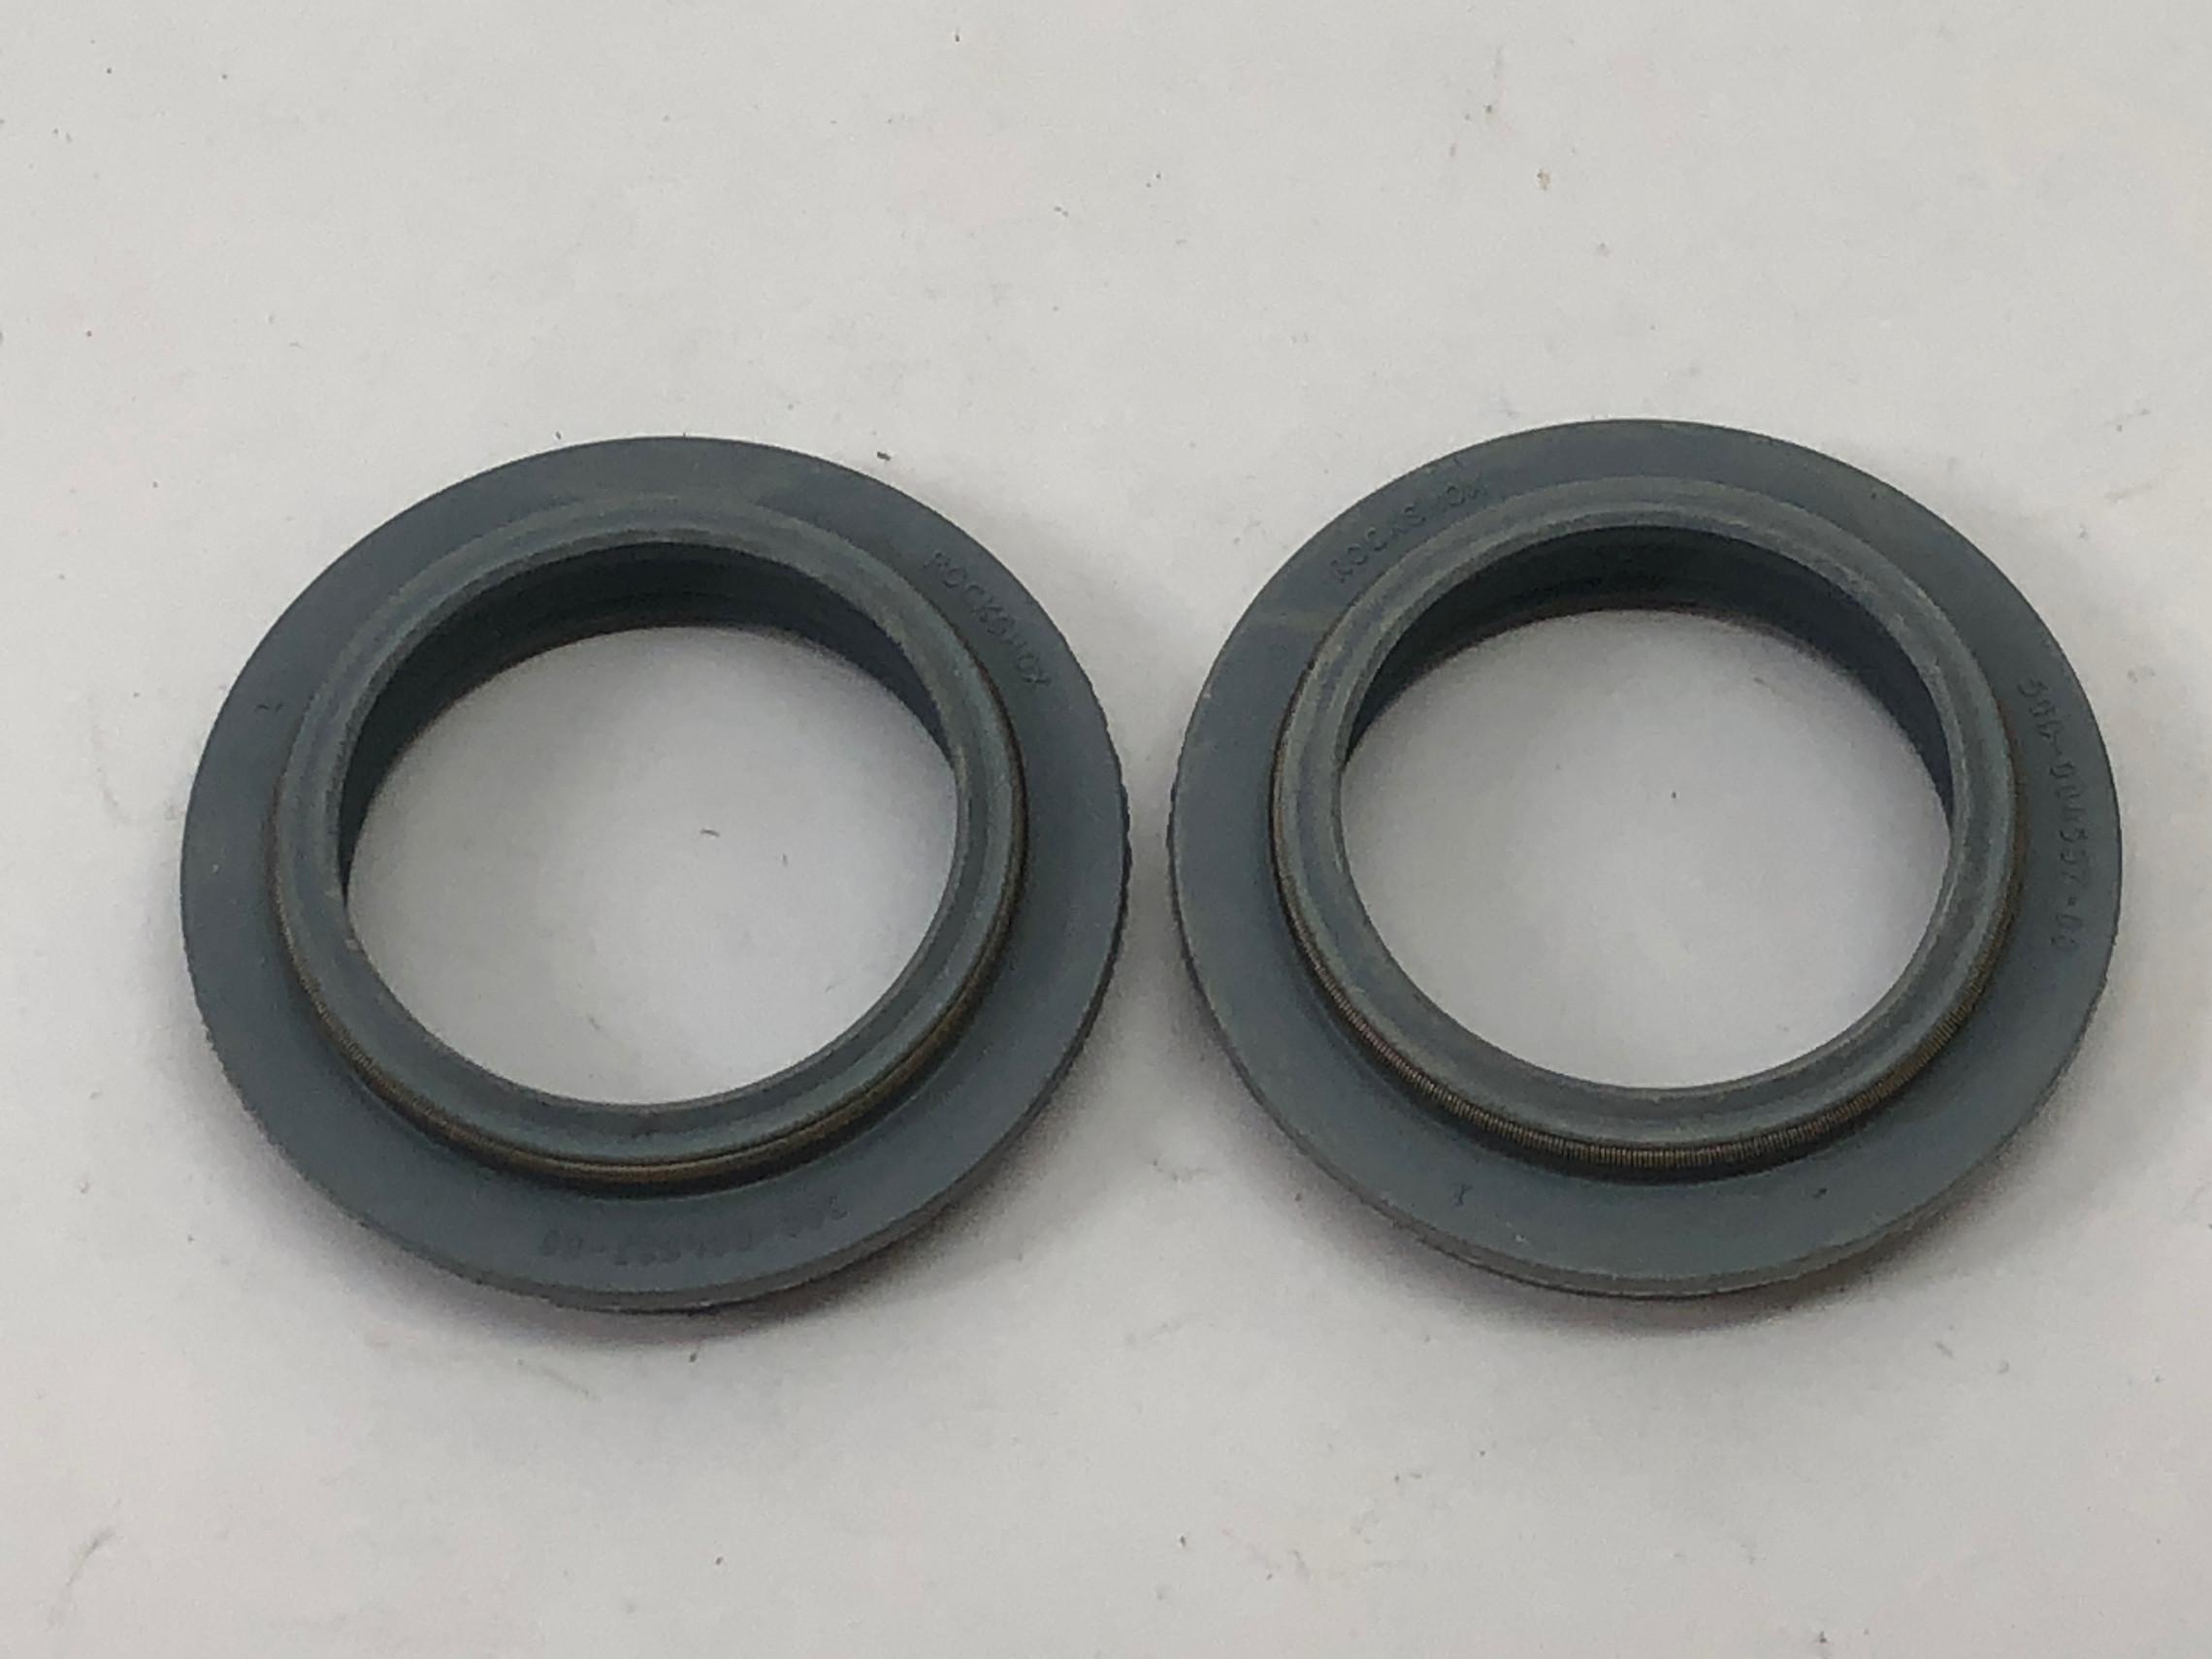 NOS Rockshox Boxxer Wipers: 32mm - 500-004537-00 (pair)